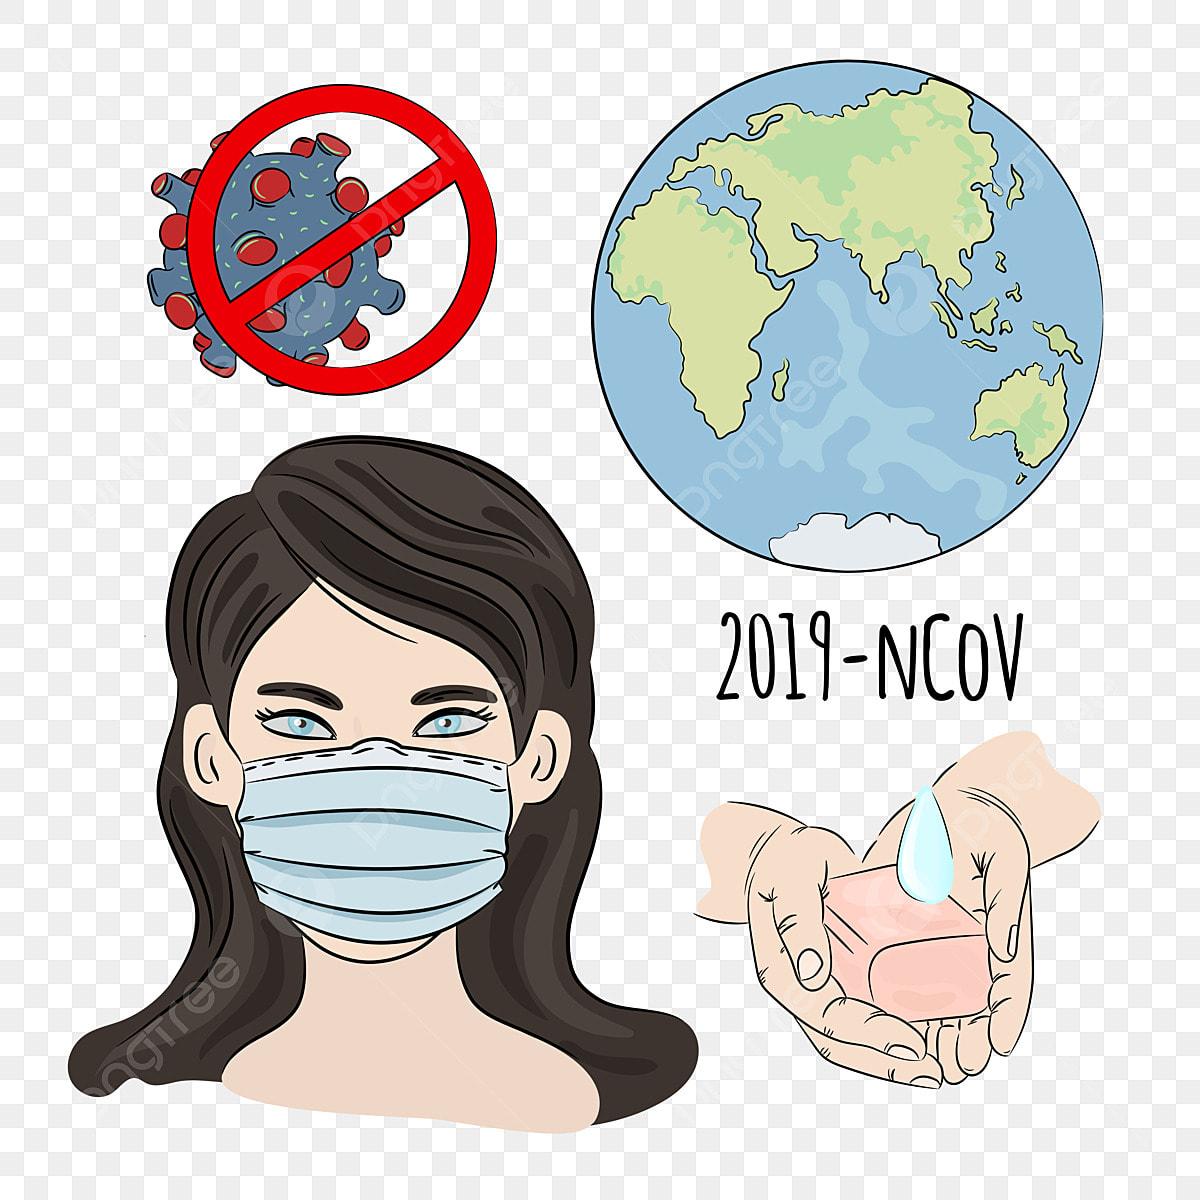 Ncov In Mask Coronavirus Health Earth Human Epidemic